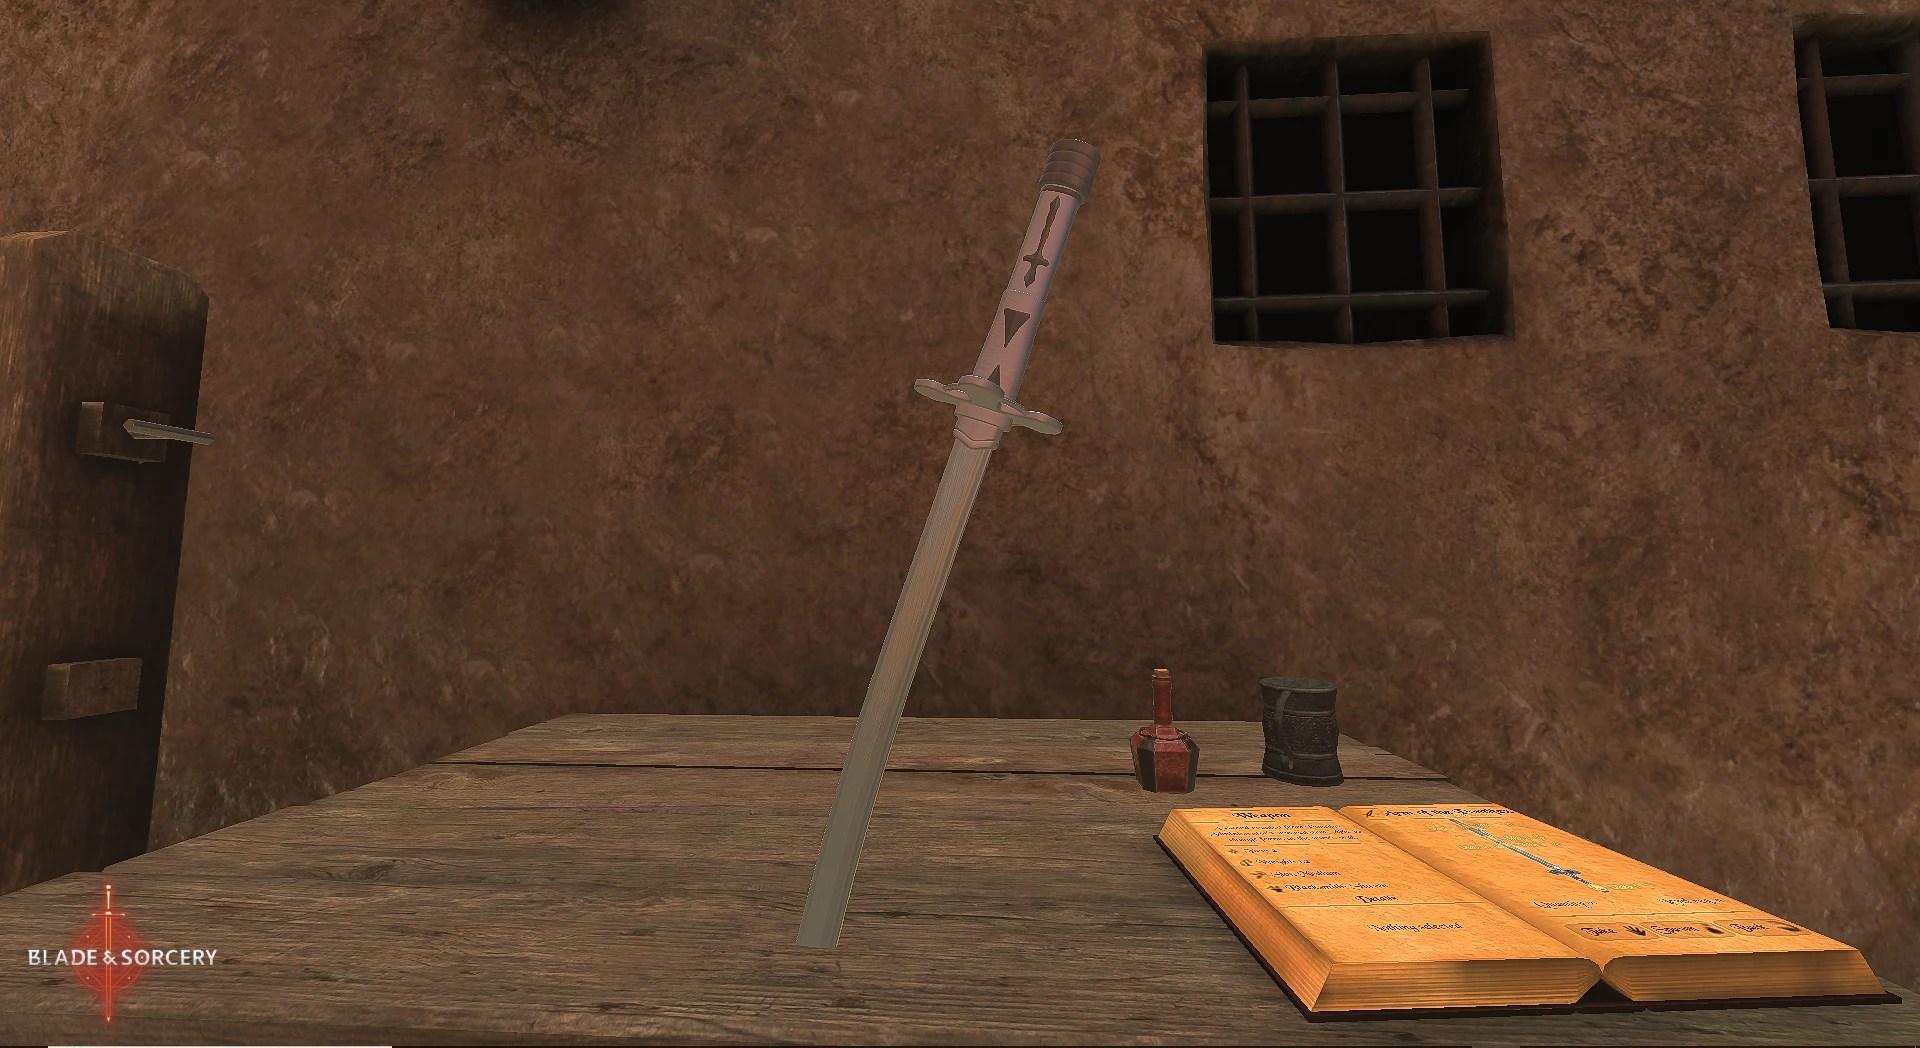 SAO Arm of the Pontifex at Blade & Sorcery Nexus - Mods and community